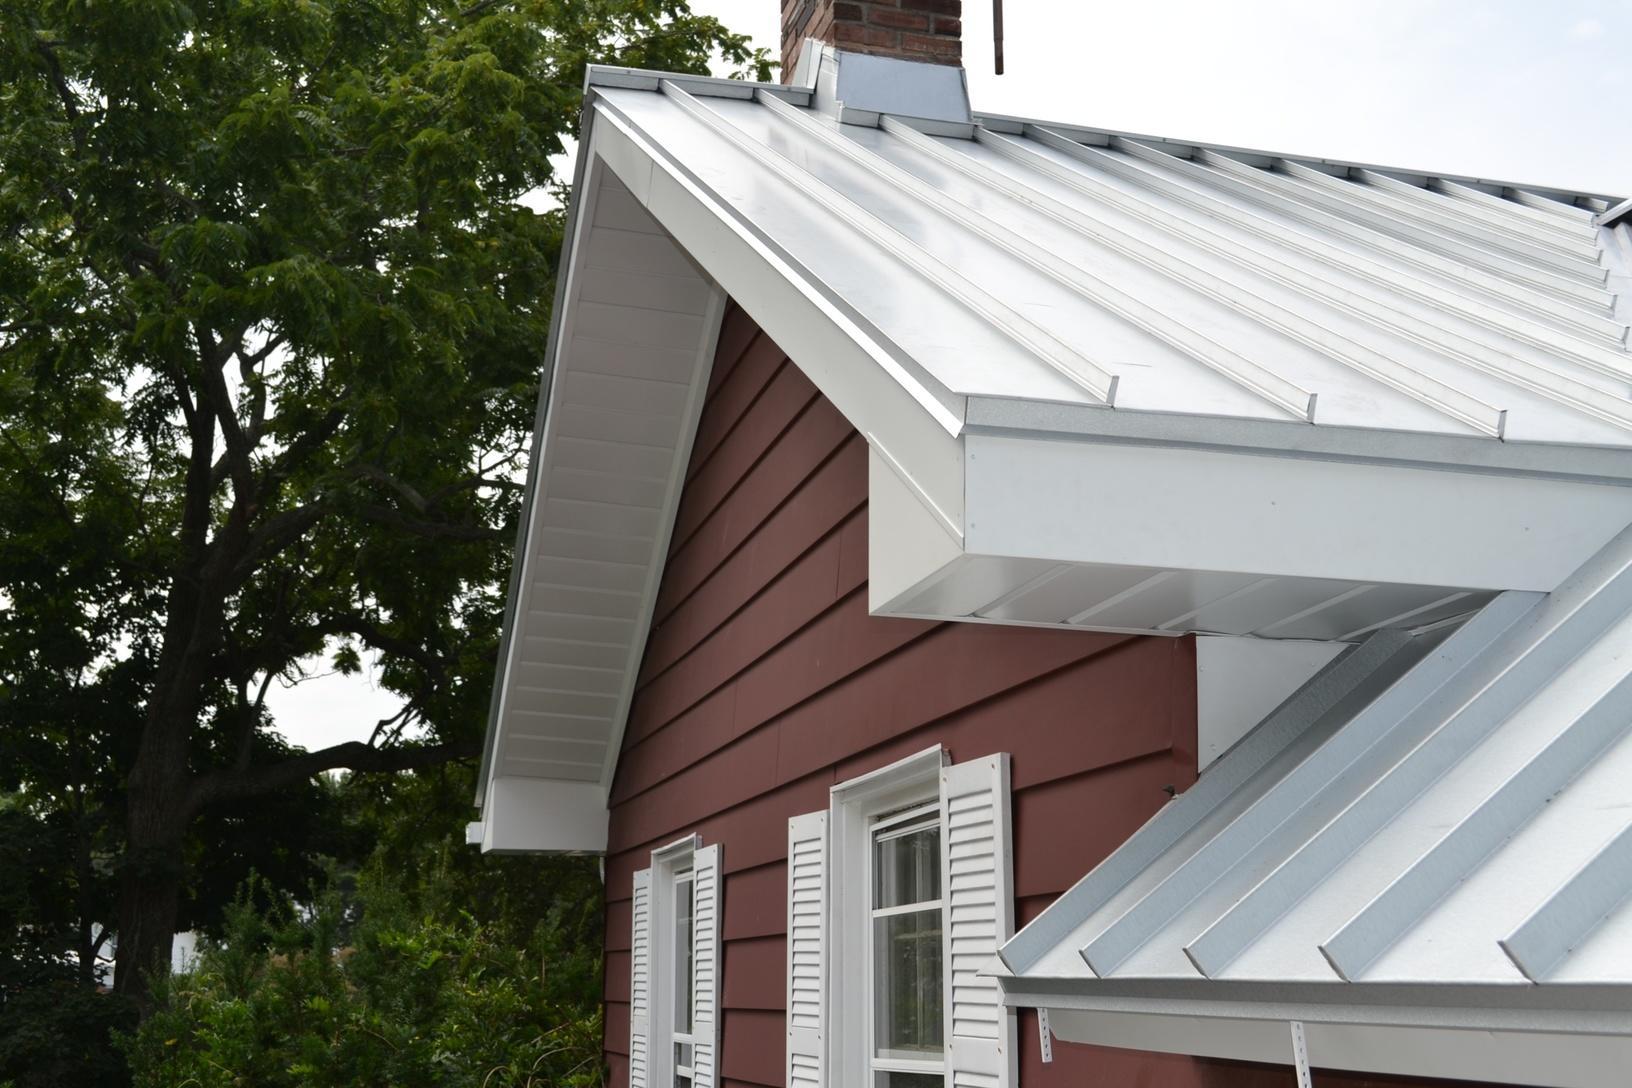 Flemington, NJ Custom Metal Roof Replacement